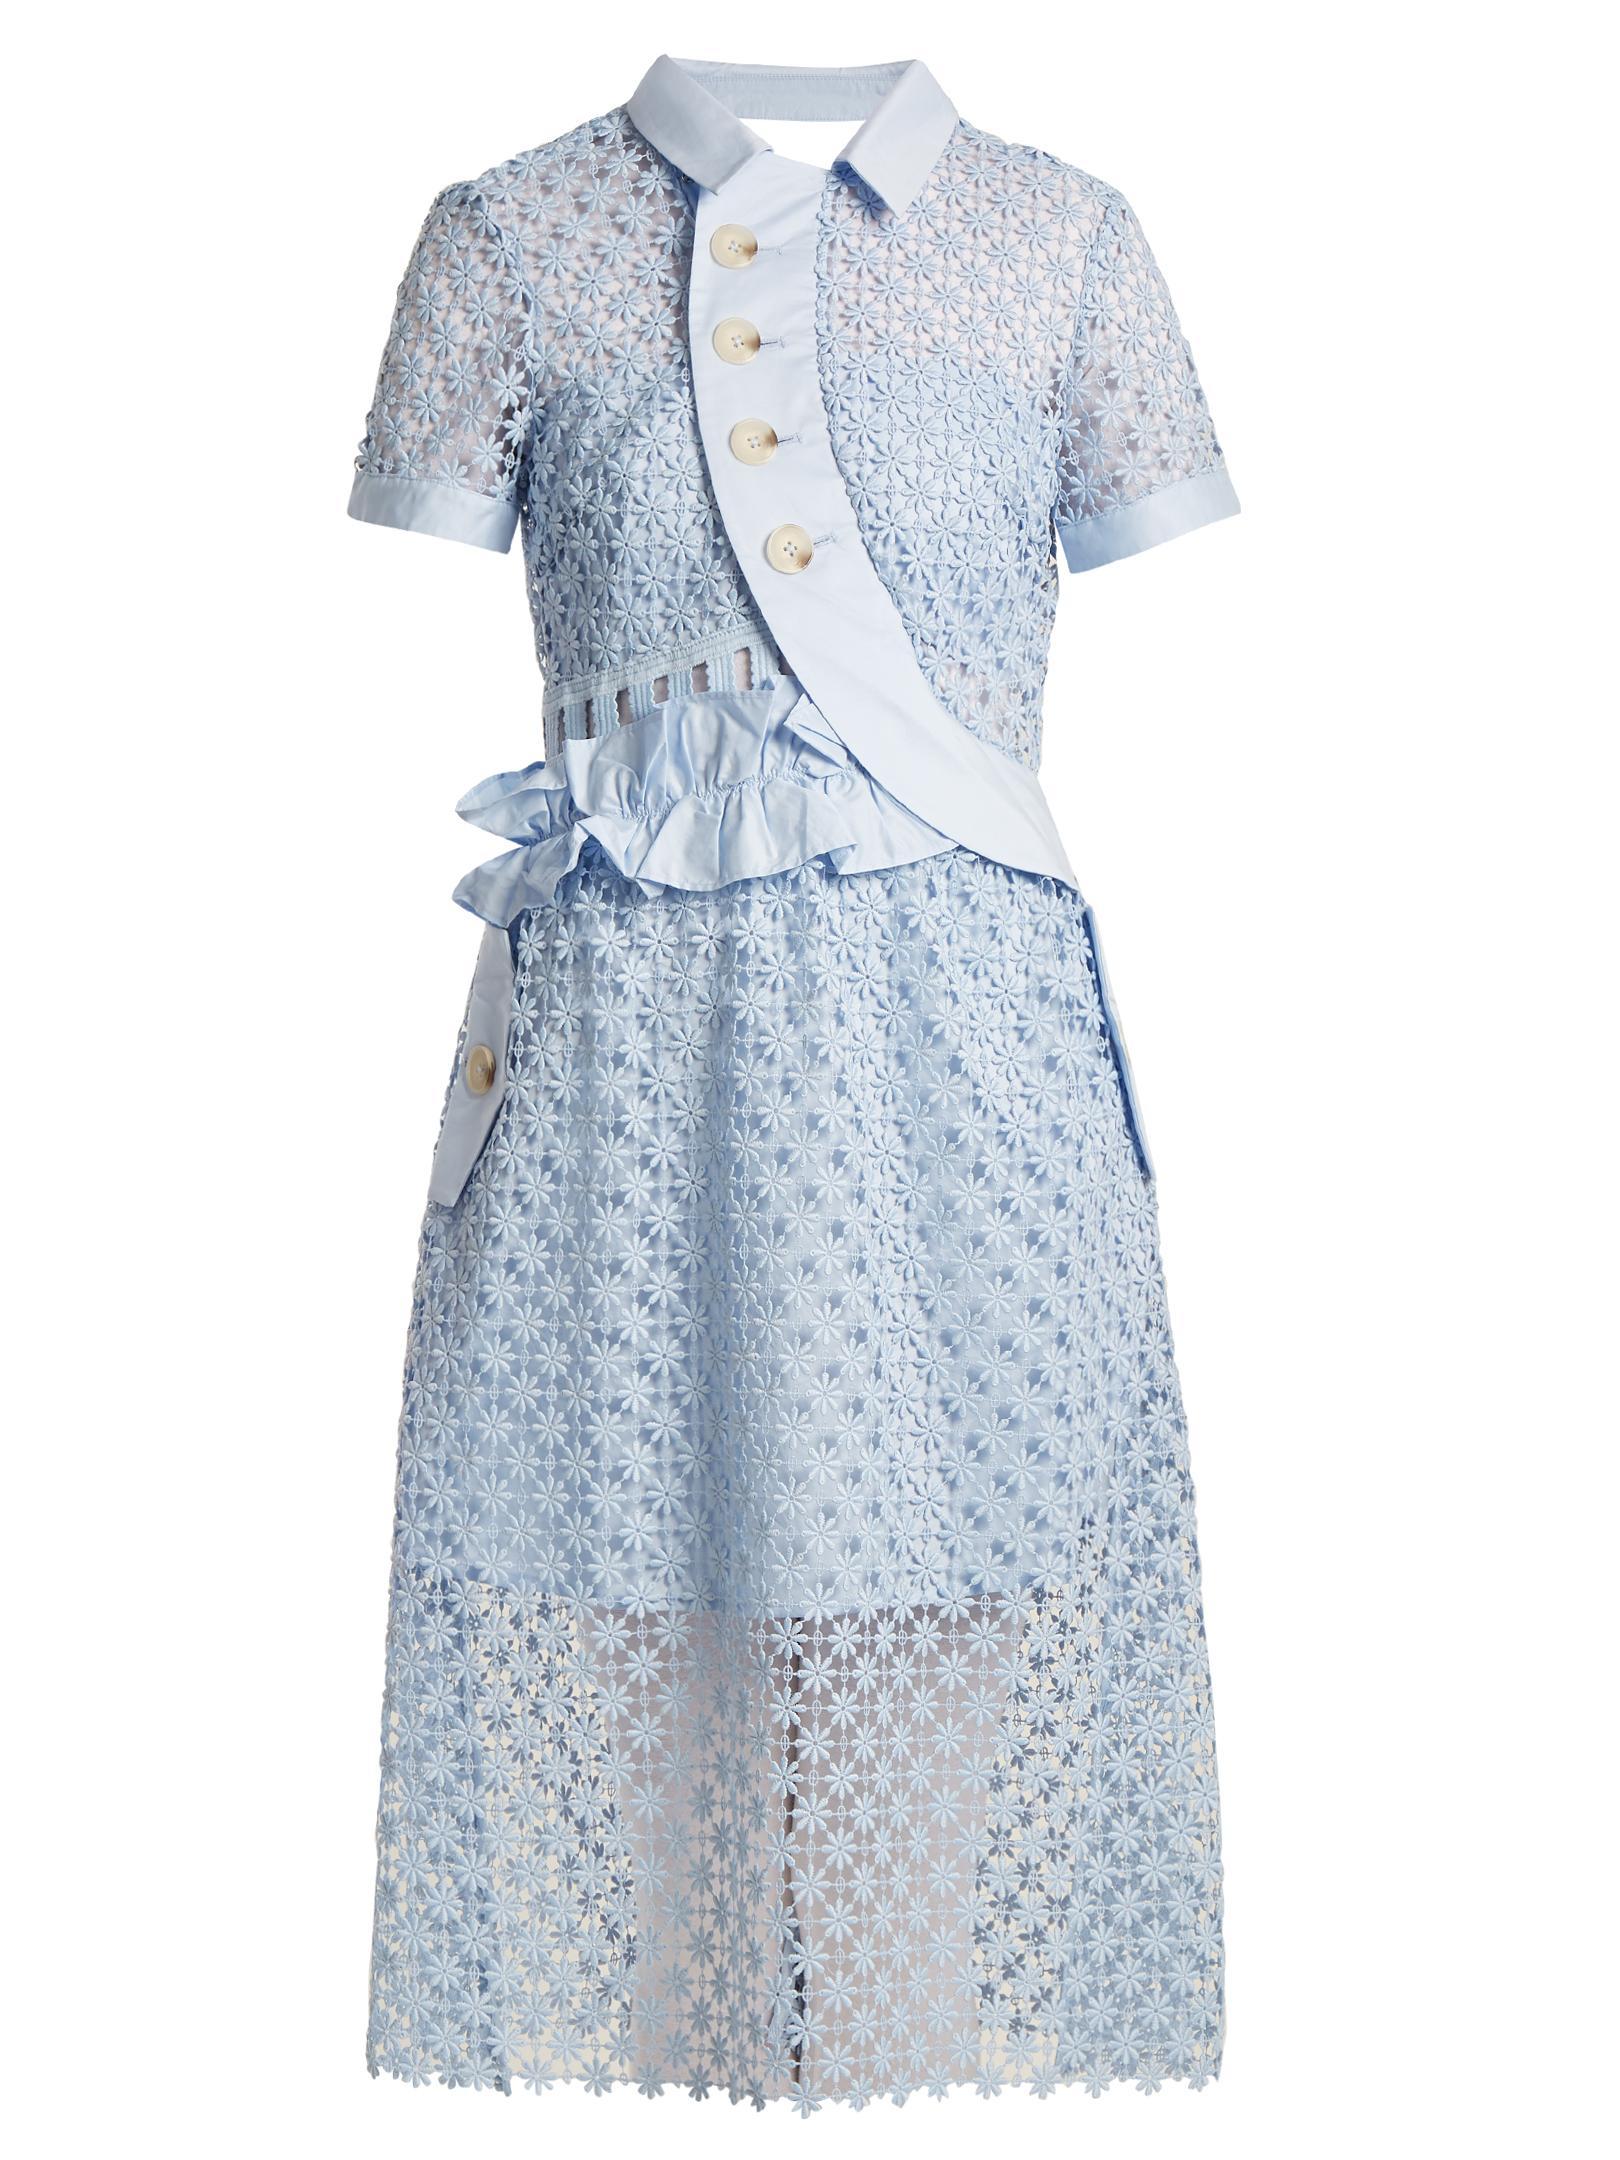 Self portrait Ruffled Cut out Lace Midi Dress in Blue